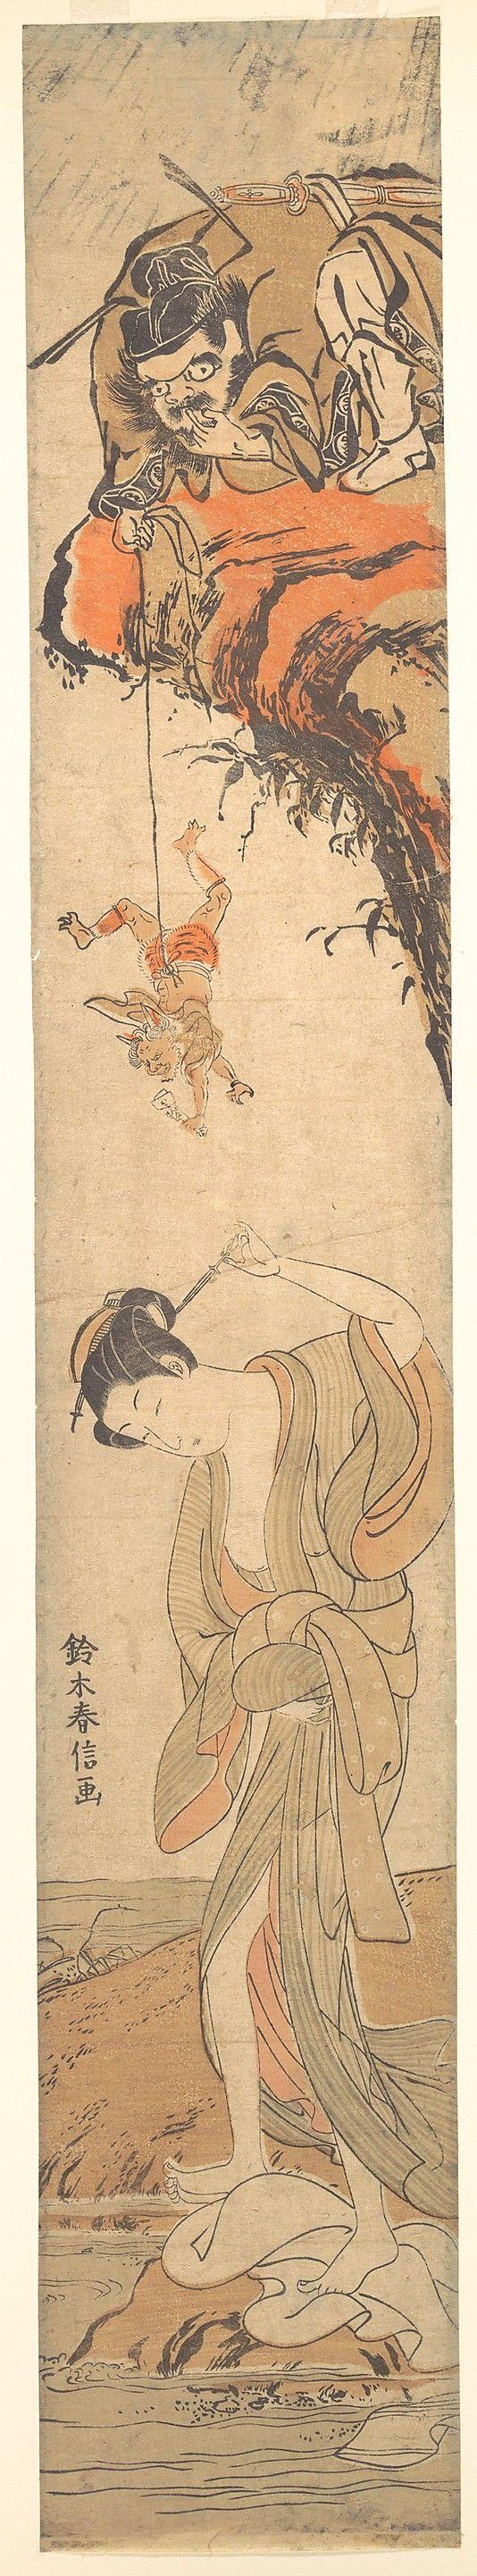 Suzuki Harunobu (Japanese, 1725–1770). Beauty with Demons, 18th century. The Metropolitan Museum of Art, New York. H. O. Havemeyer Collection, Bequest of Mrs. H. O. Havemeyer, 1929 (JP1656) #demon #Halloween